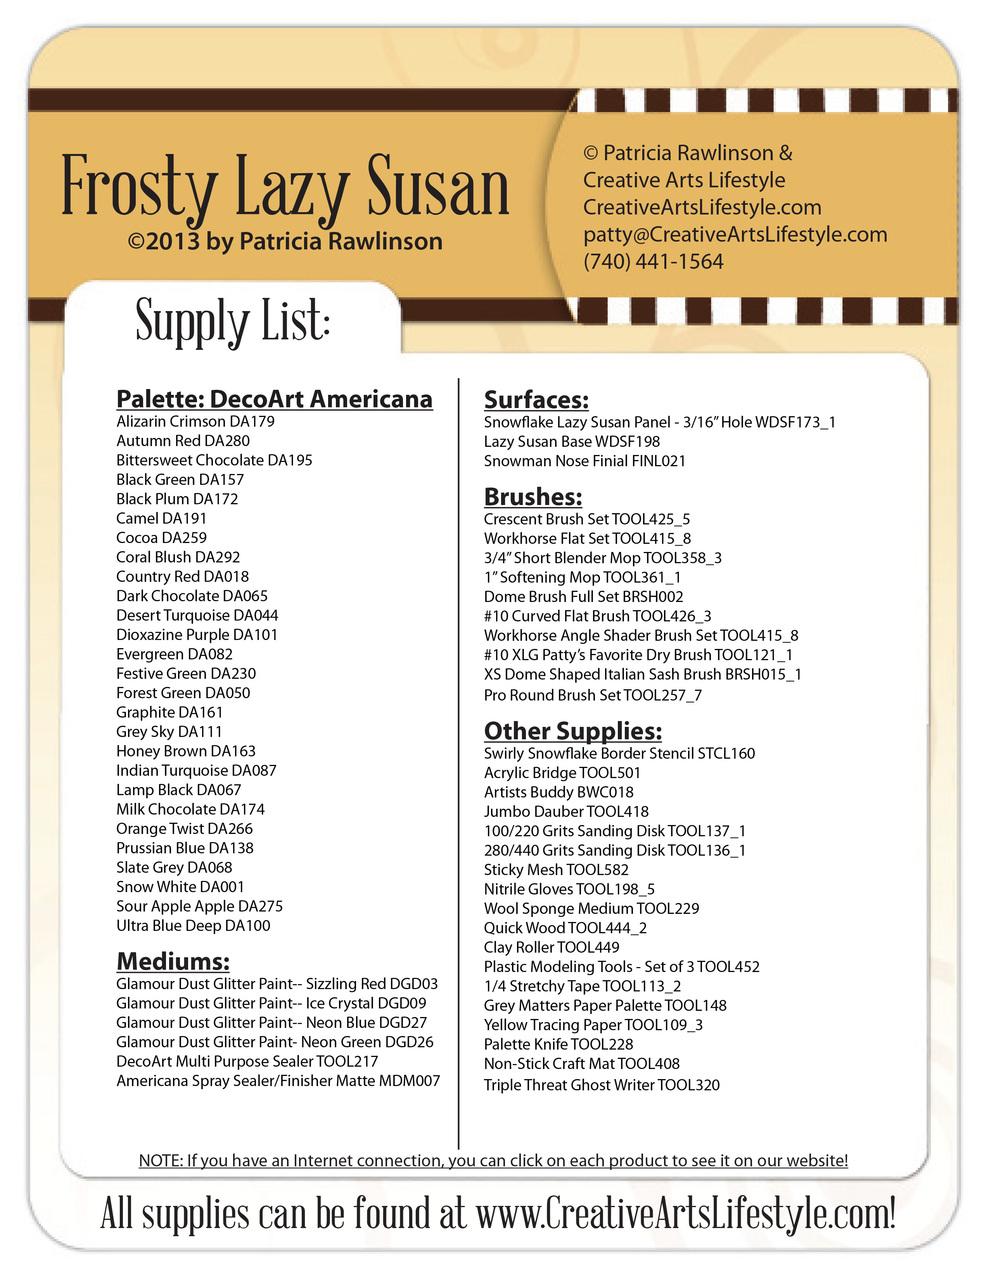 Frosty Lazy Susan E-Packet - Patricia Rawlinson